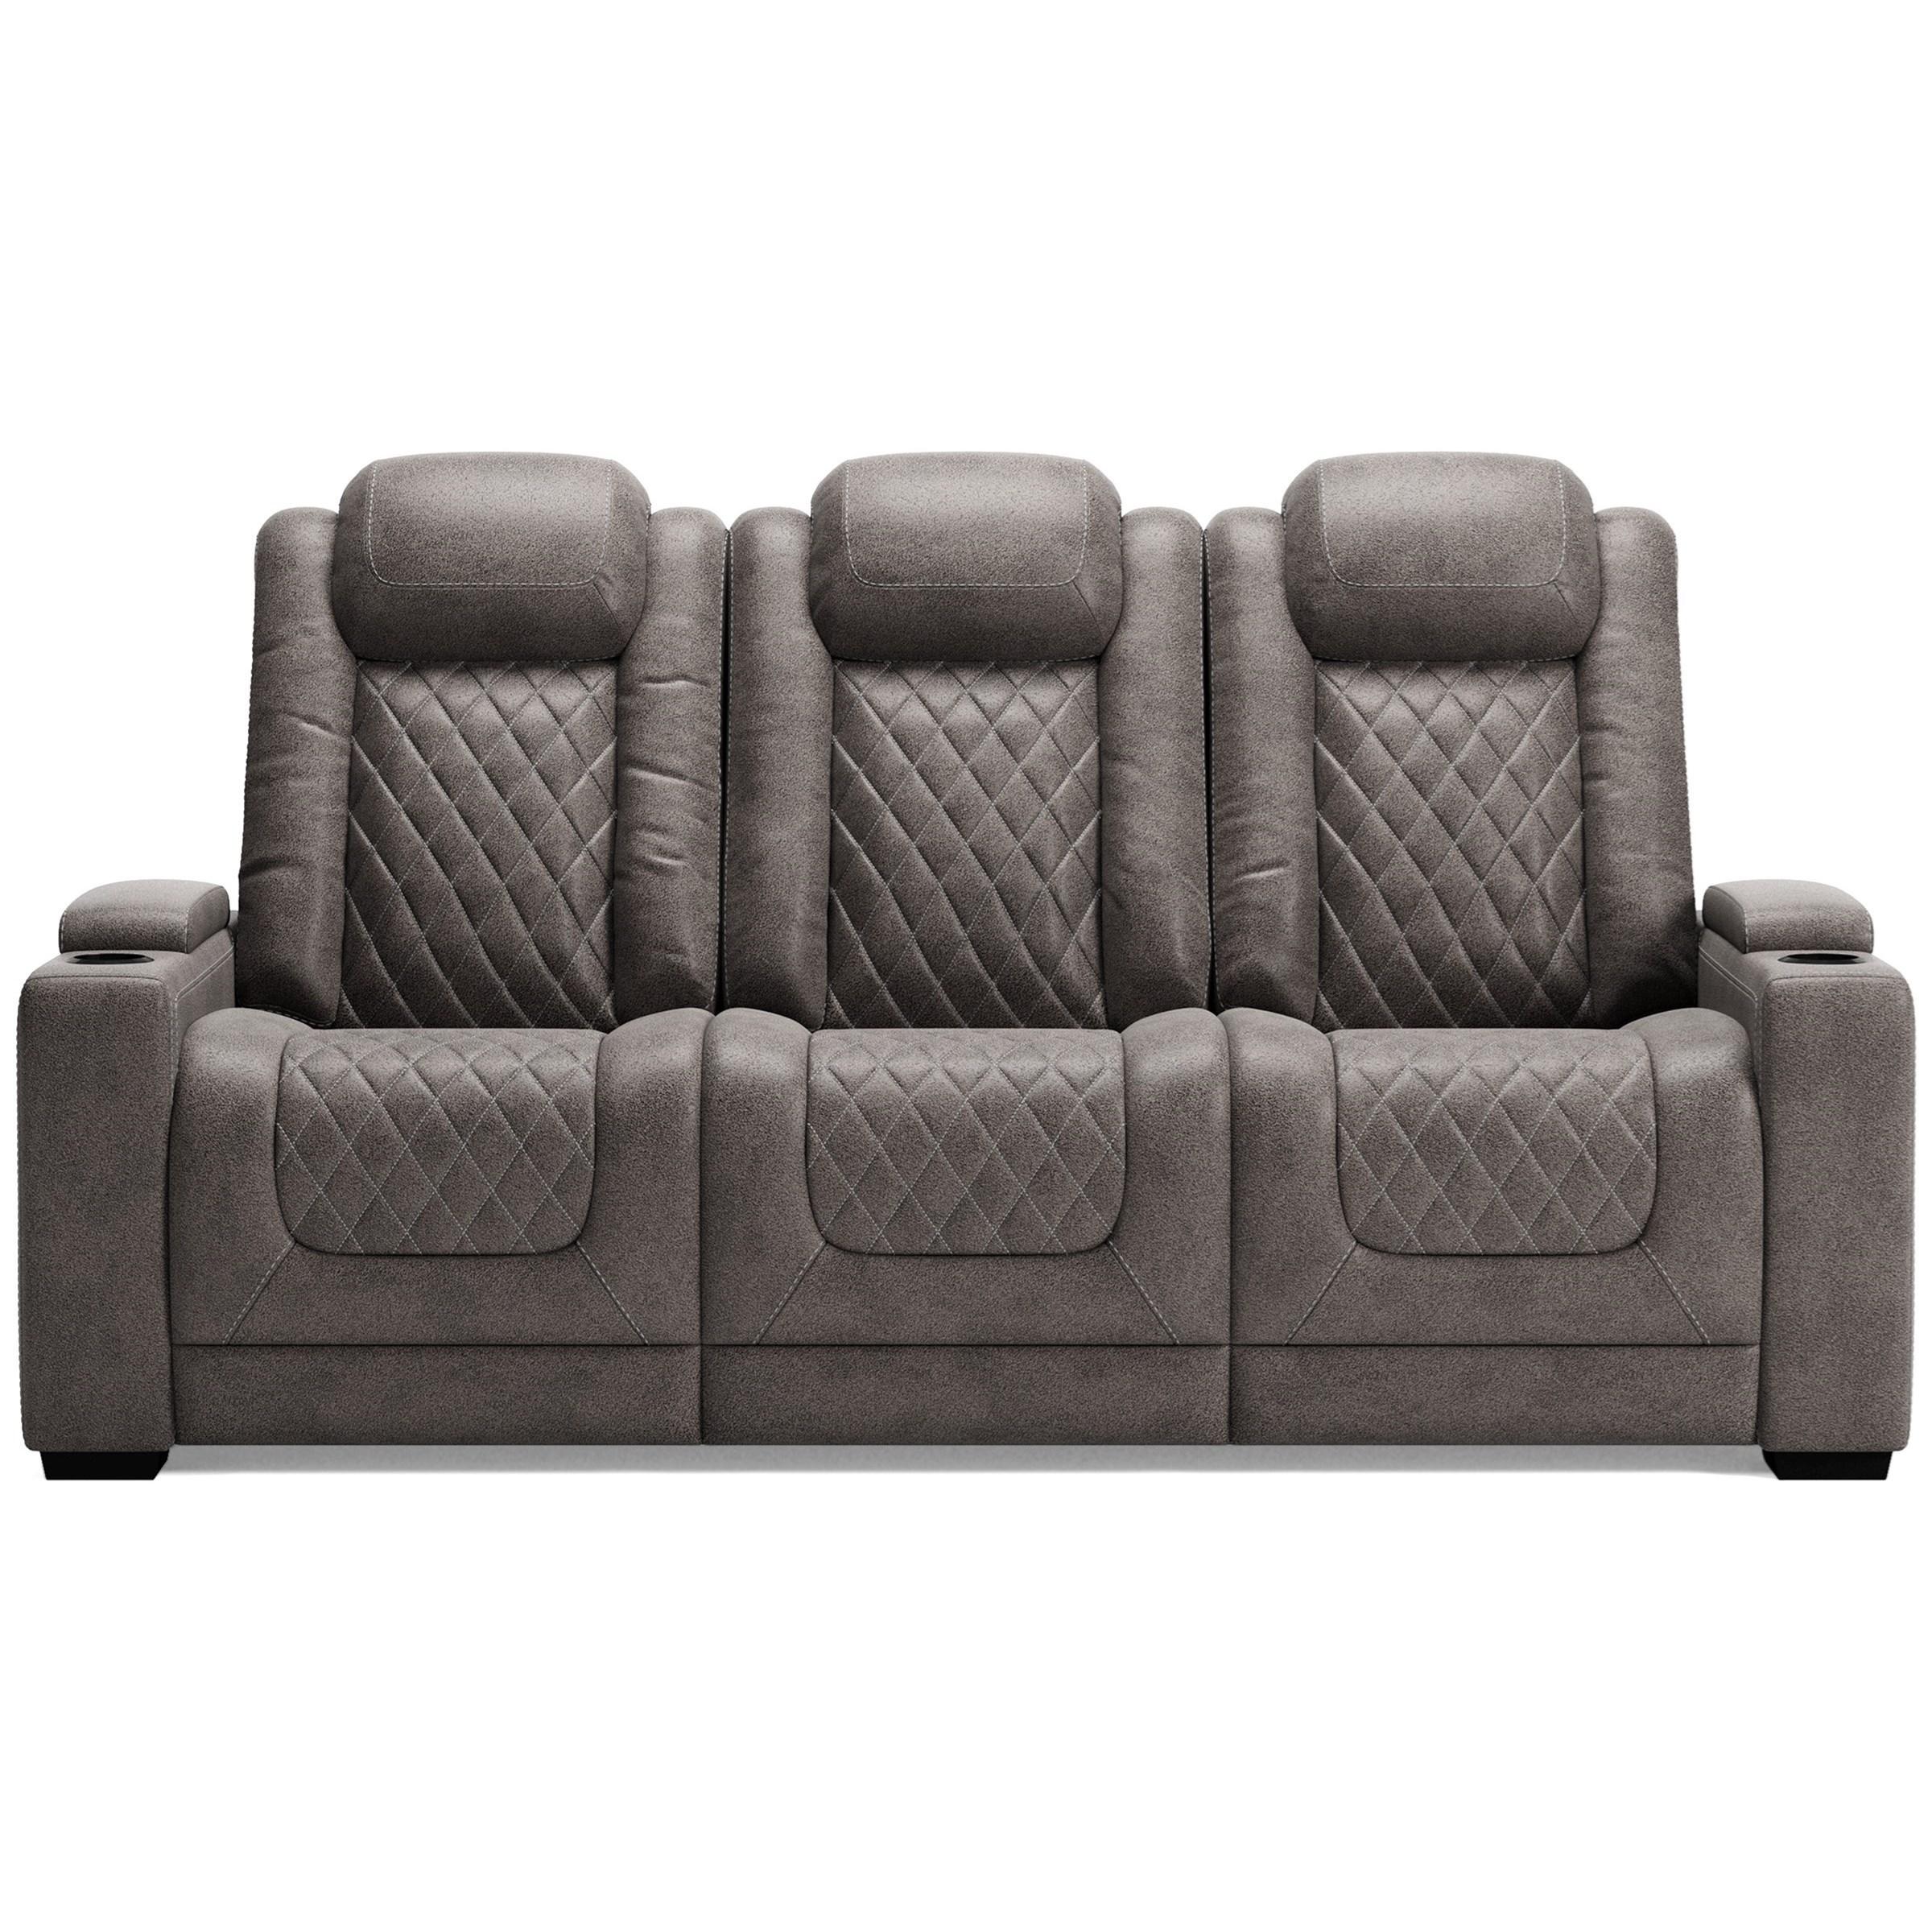 Hyllmont Pwr Rec Sofa with Adj Headrests by Ashley (Signature Design) at Johnny Janosik